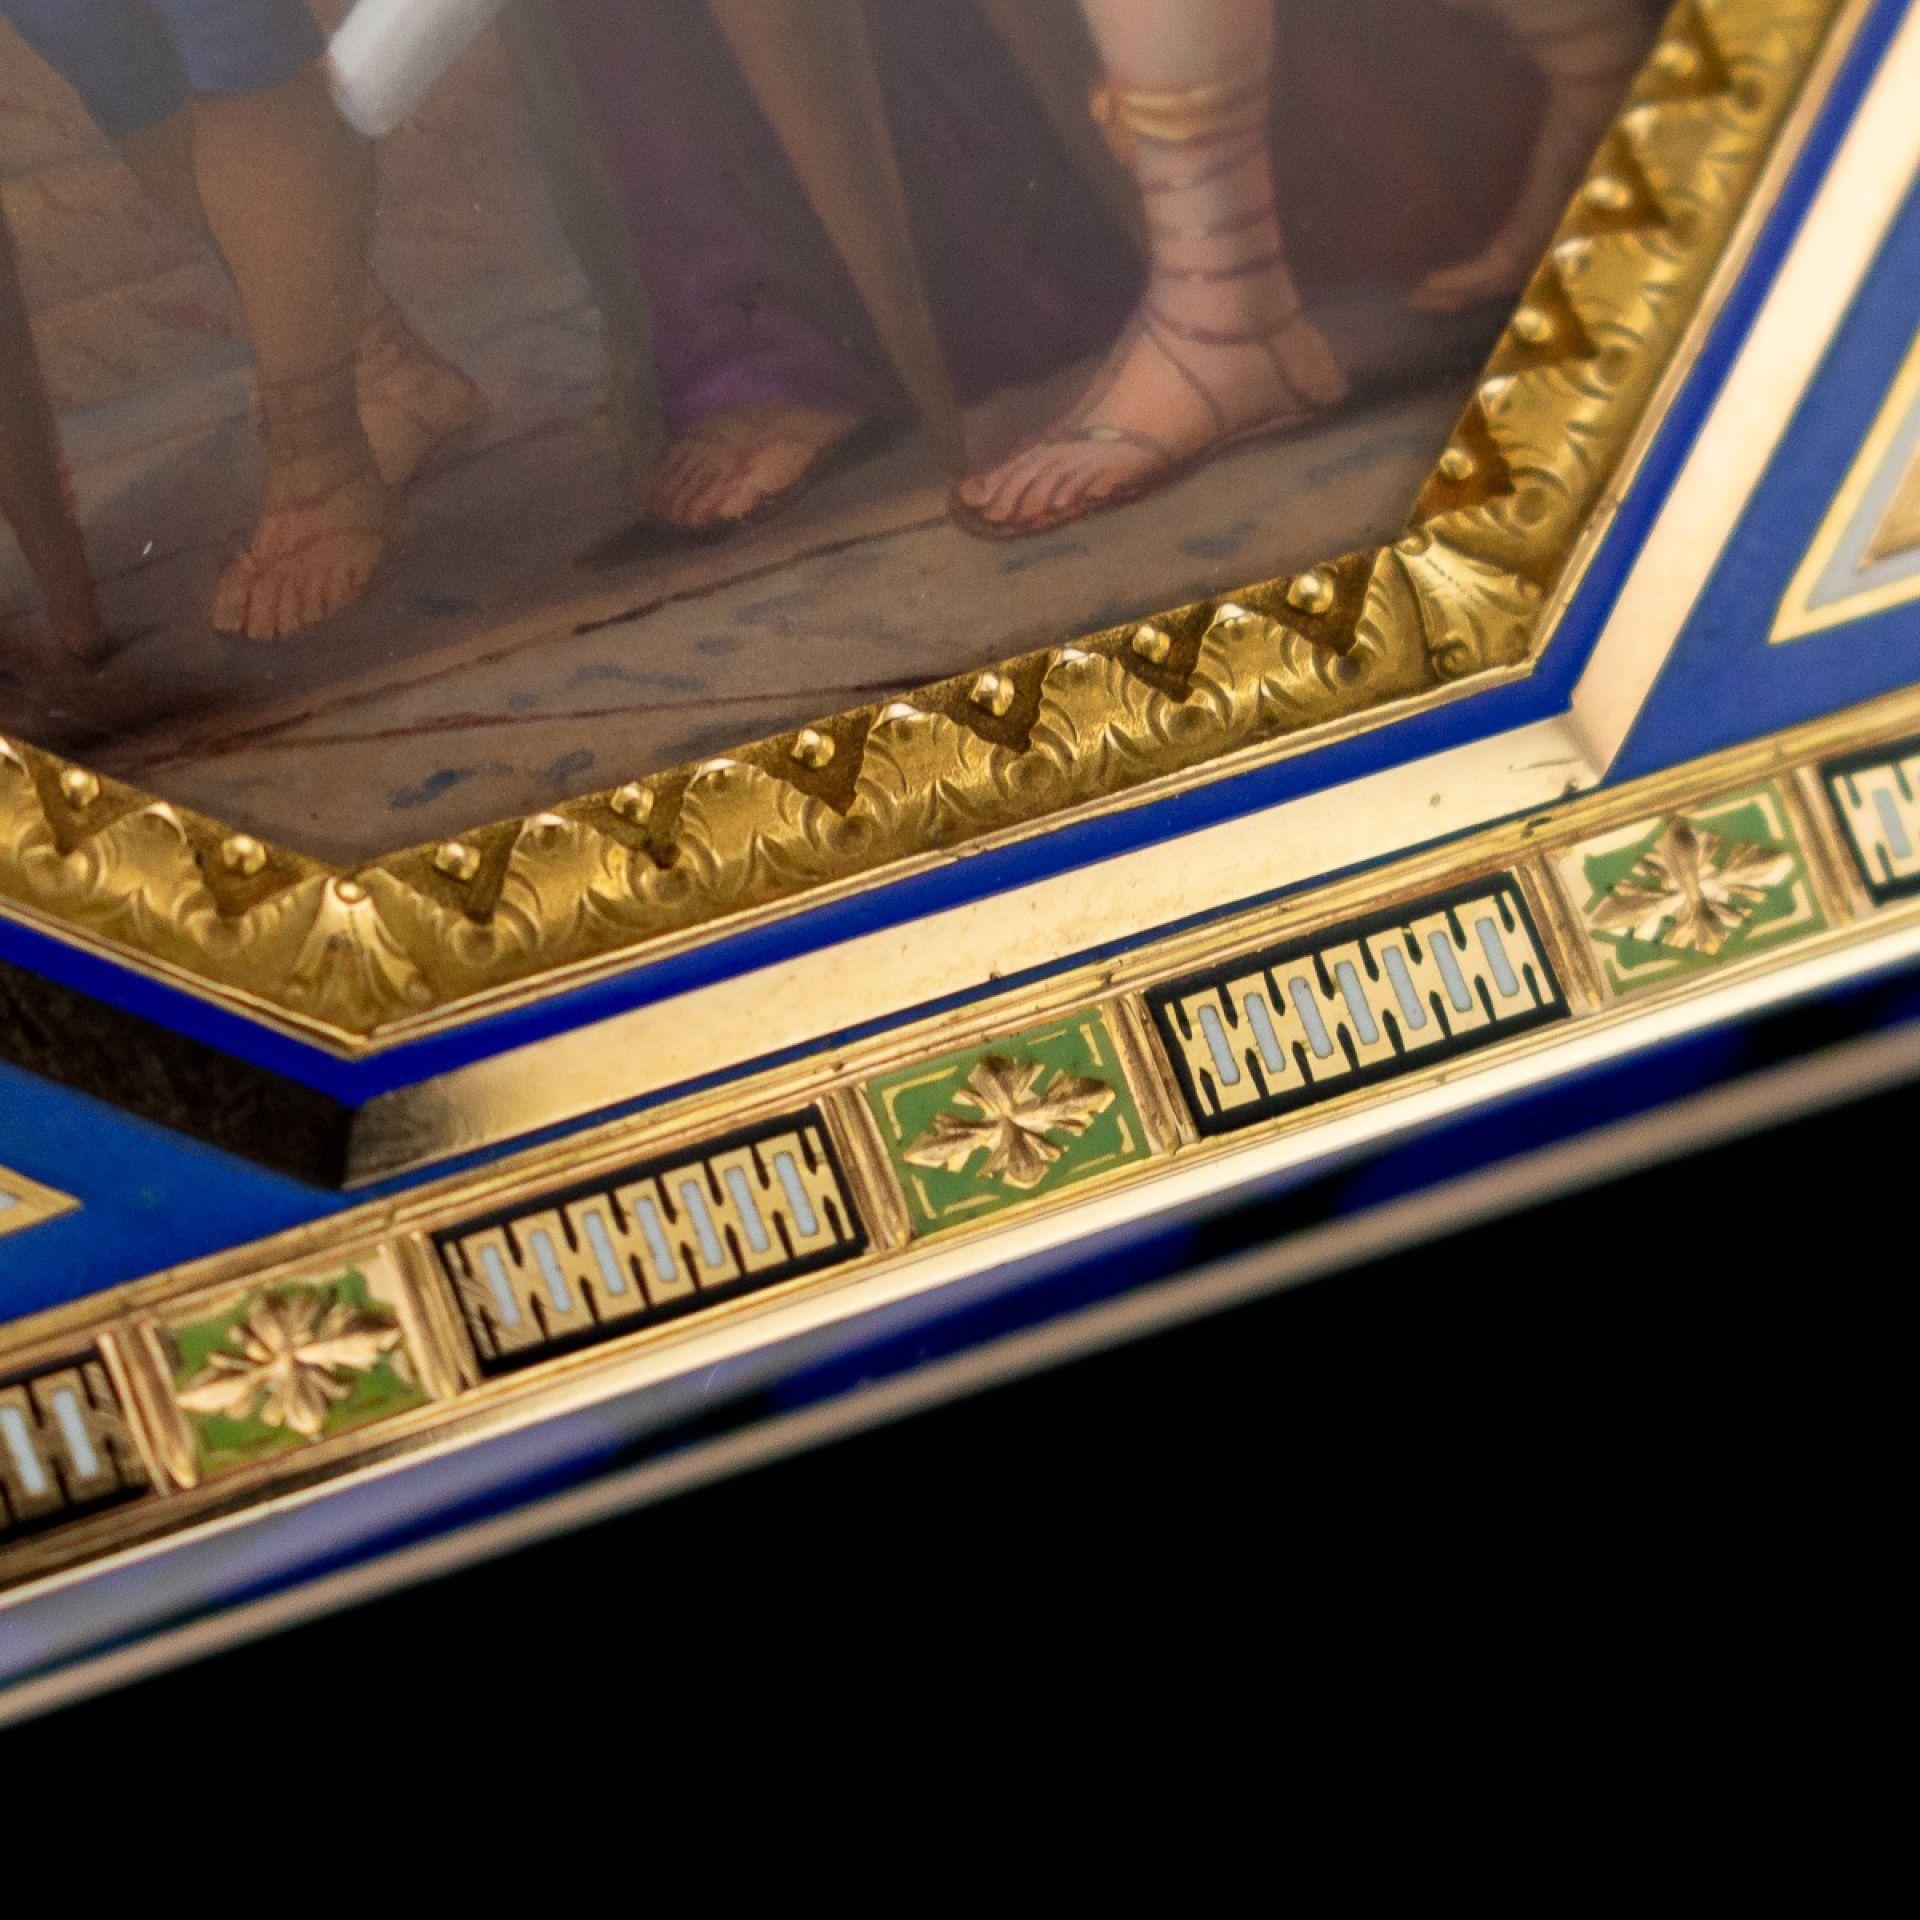 ANTIQUE 19thC SWISS 18k GOLD & ENAMEL SNUFF BOX, REMOND, LAMY & CIE c.1800